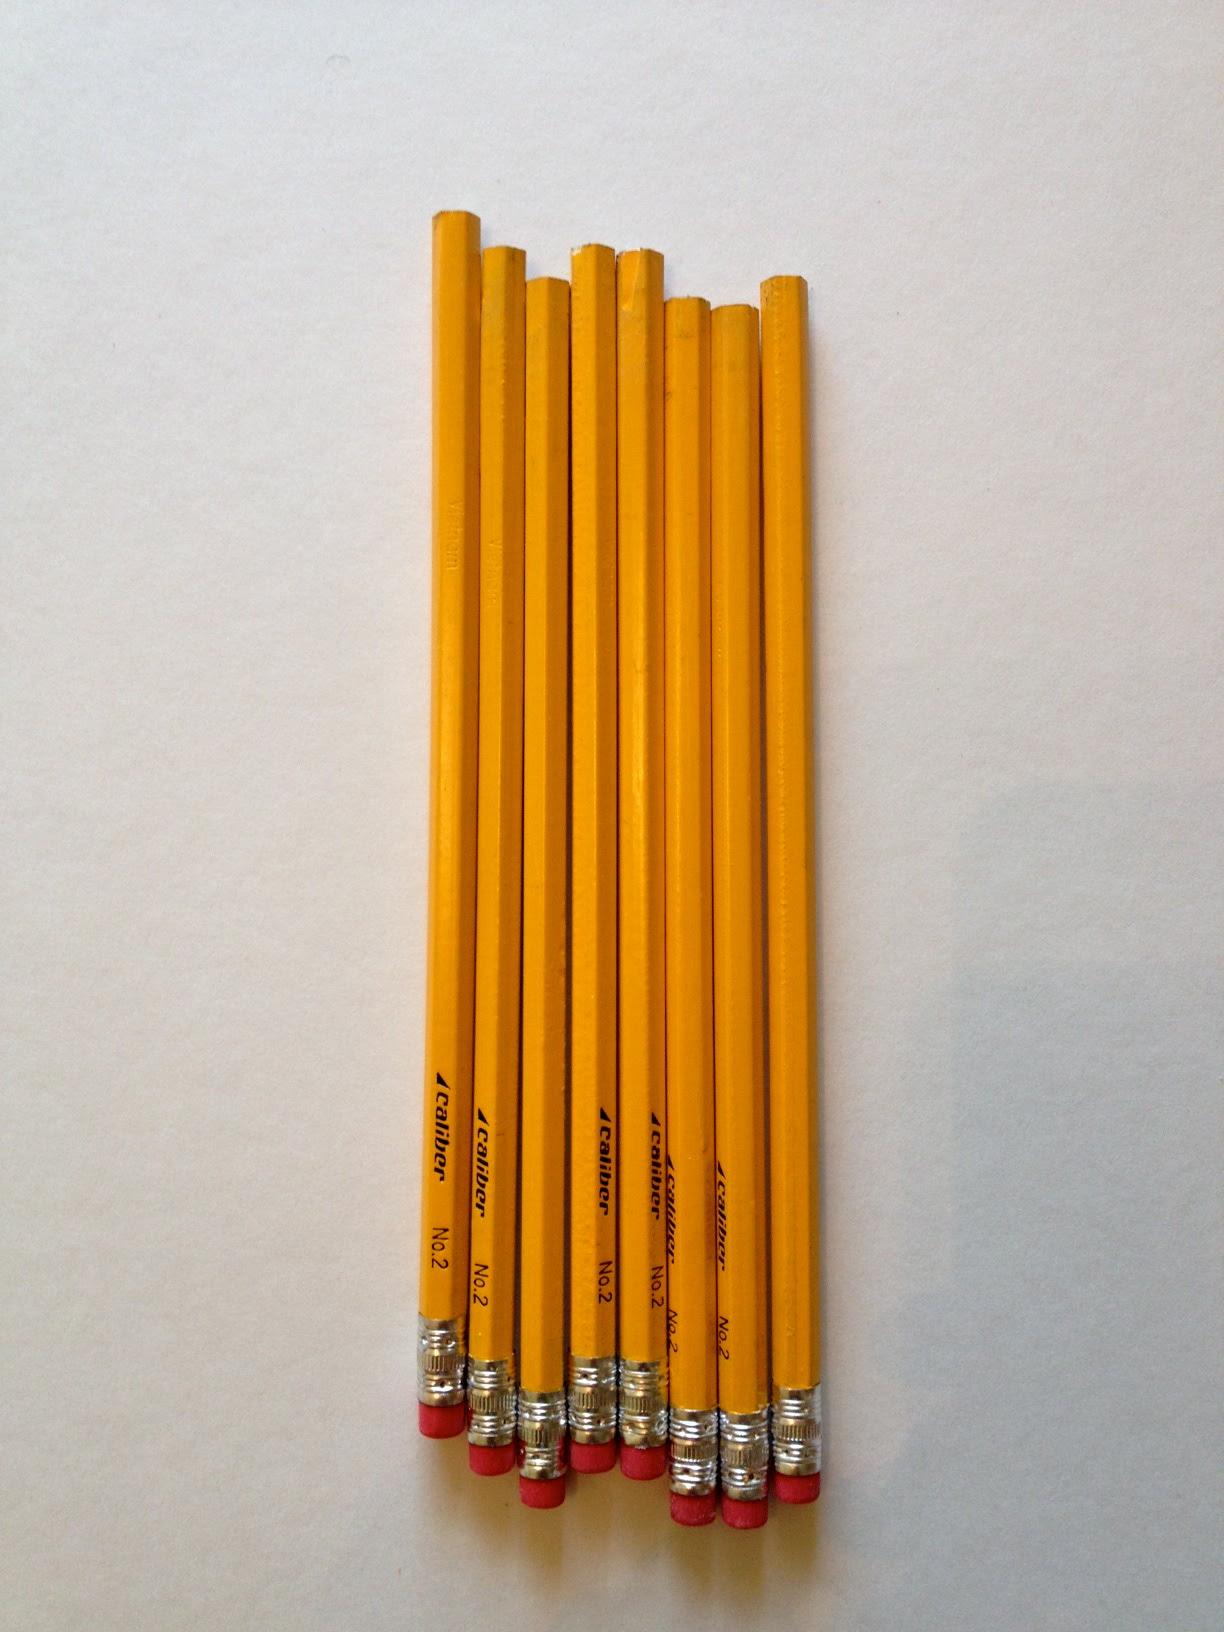 DIY] Color Block Leather Pencil Holder | J to Z